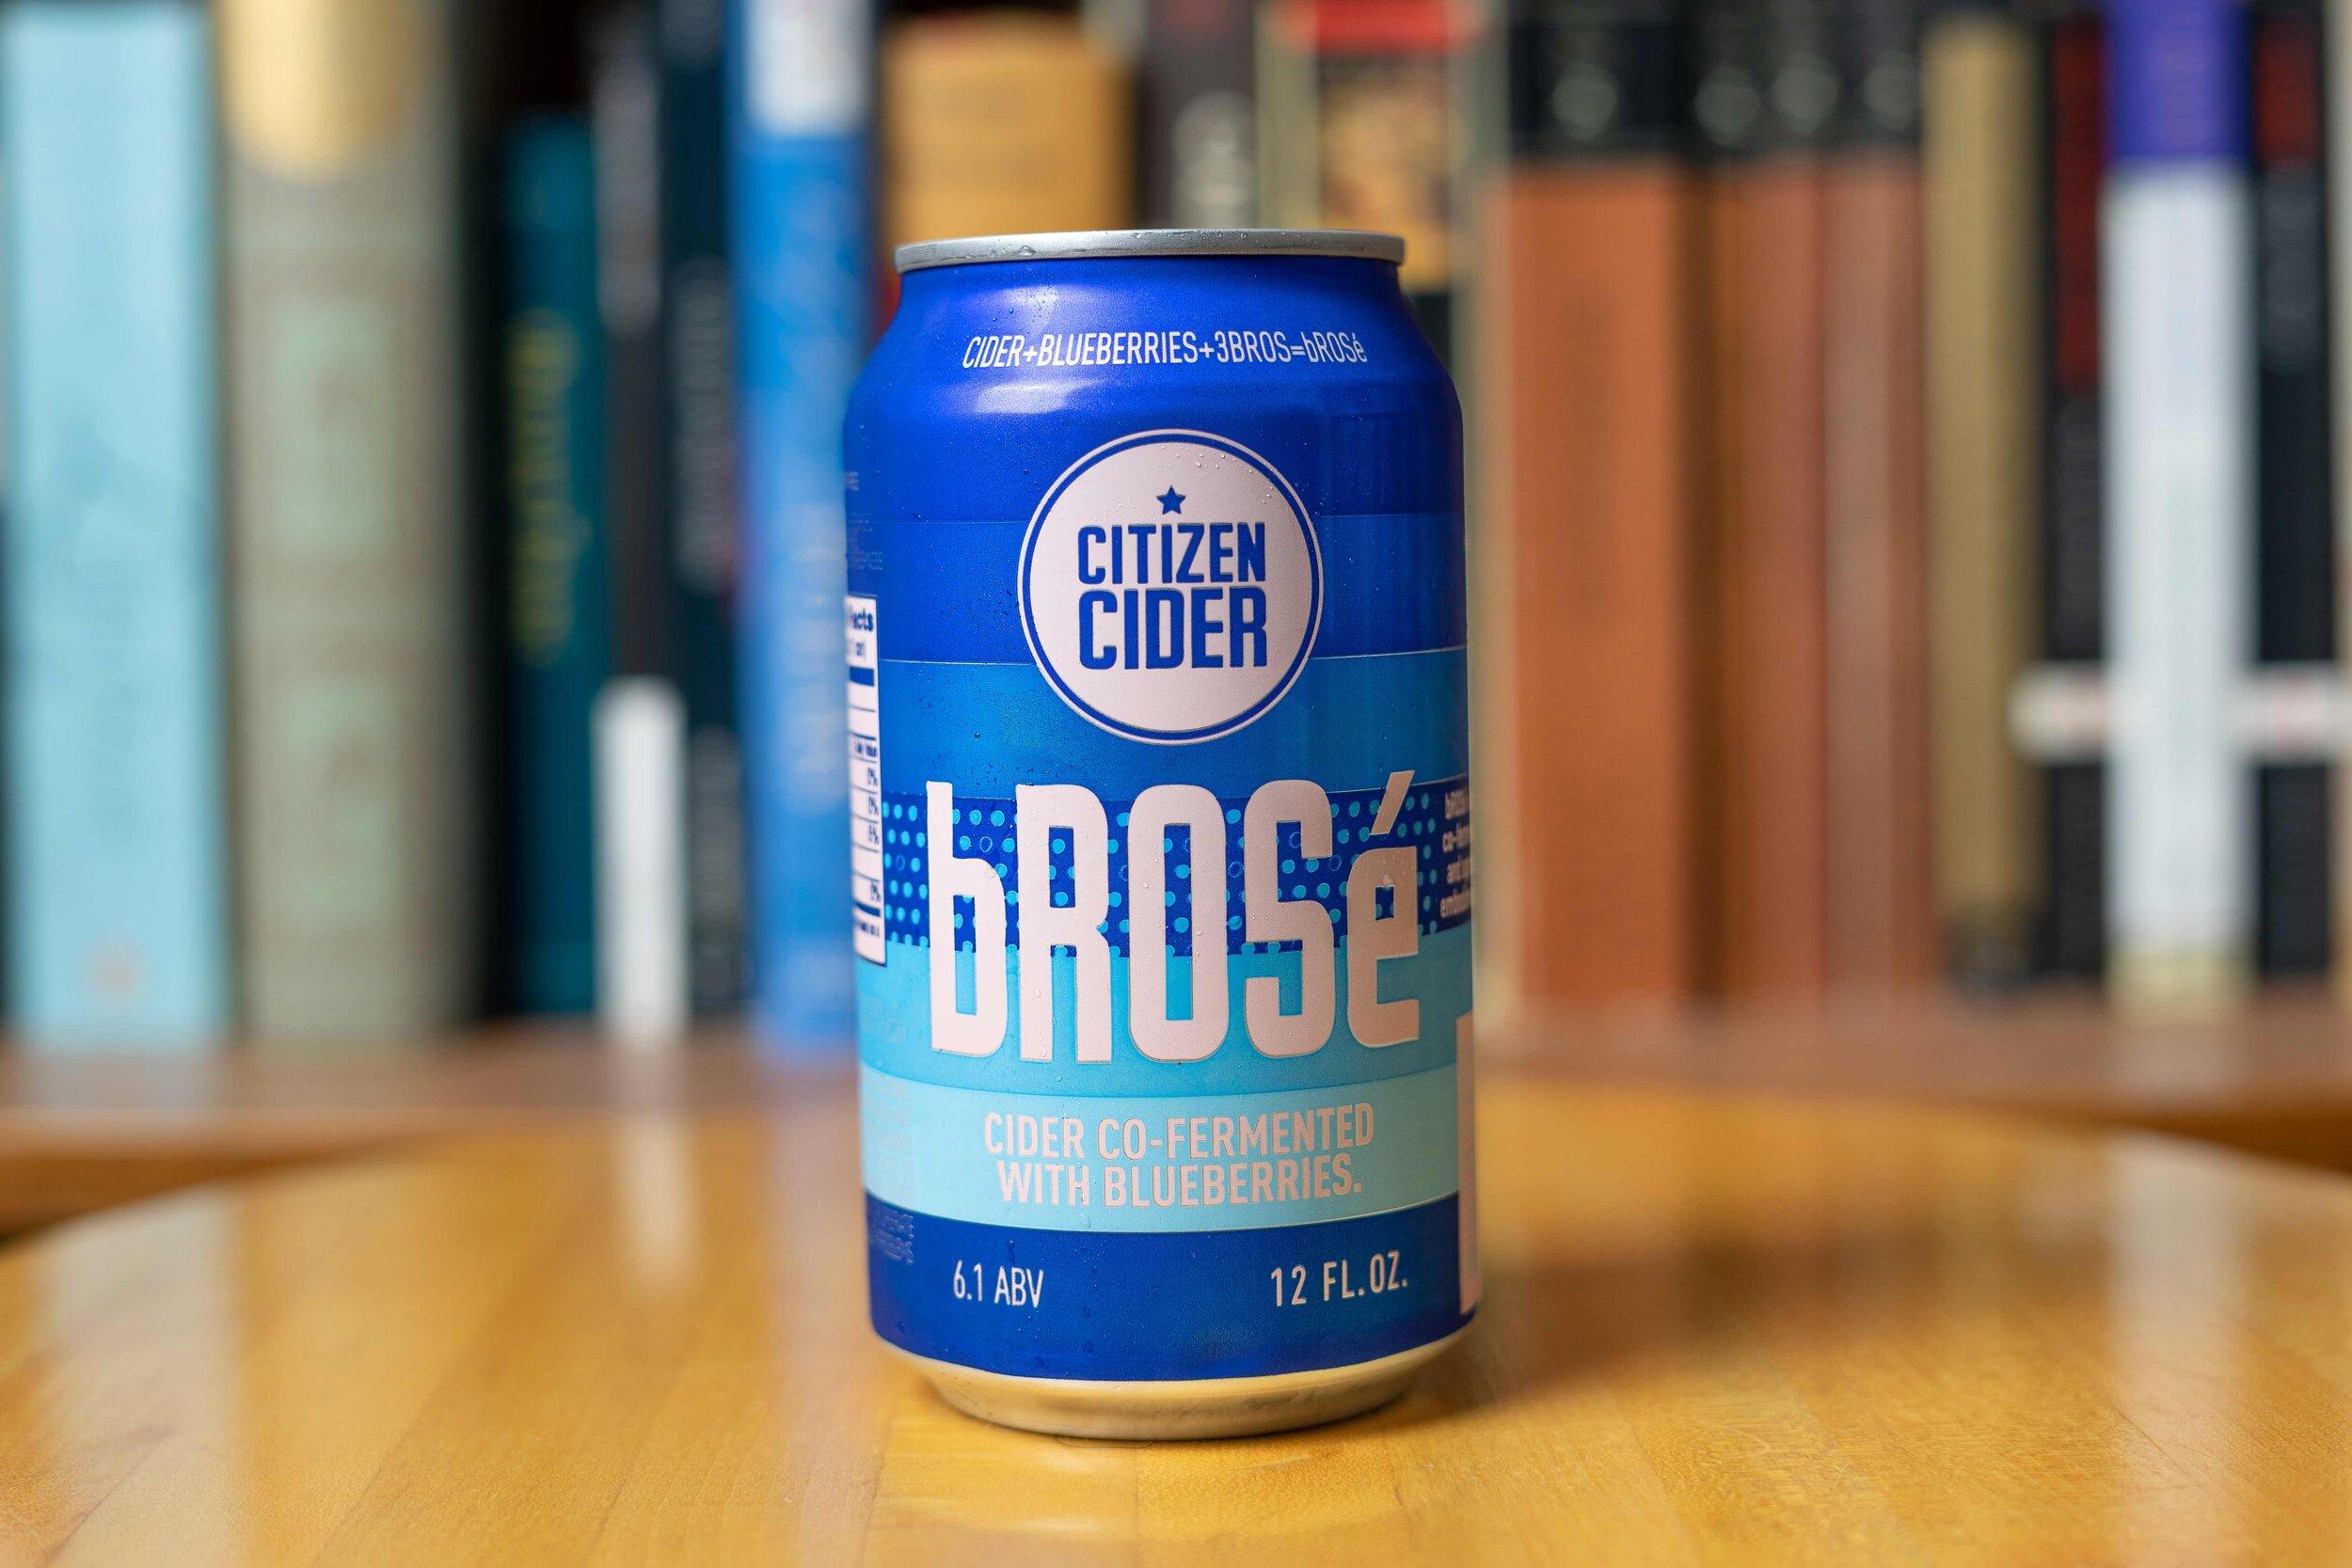 Citizen Cider bRosé